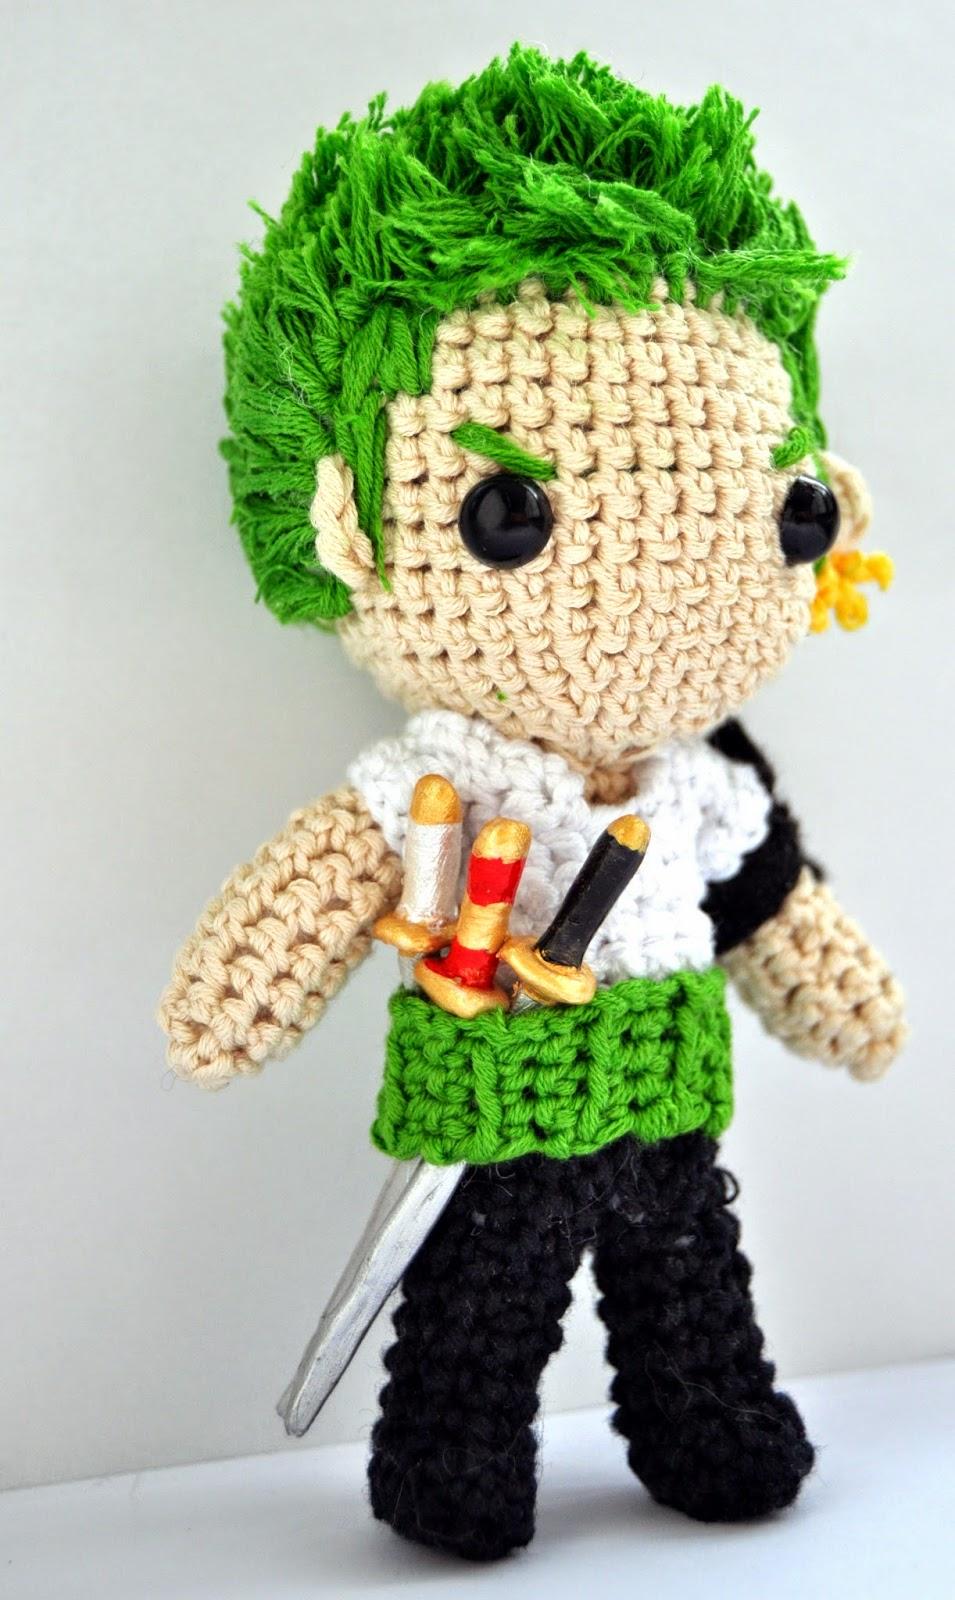 Amigurumi One Piece : 1000+ images about Amigurumi on Pinterest One piece ...